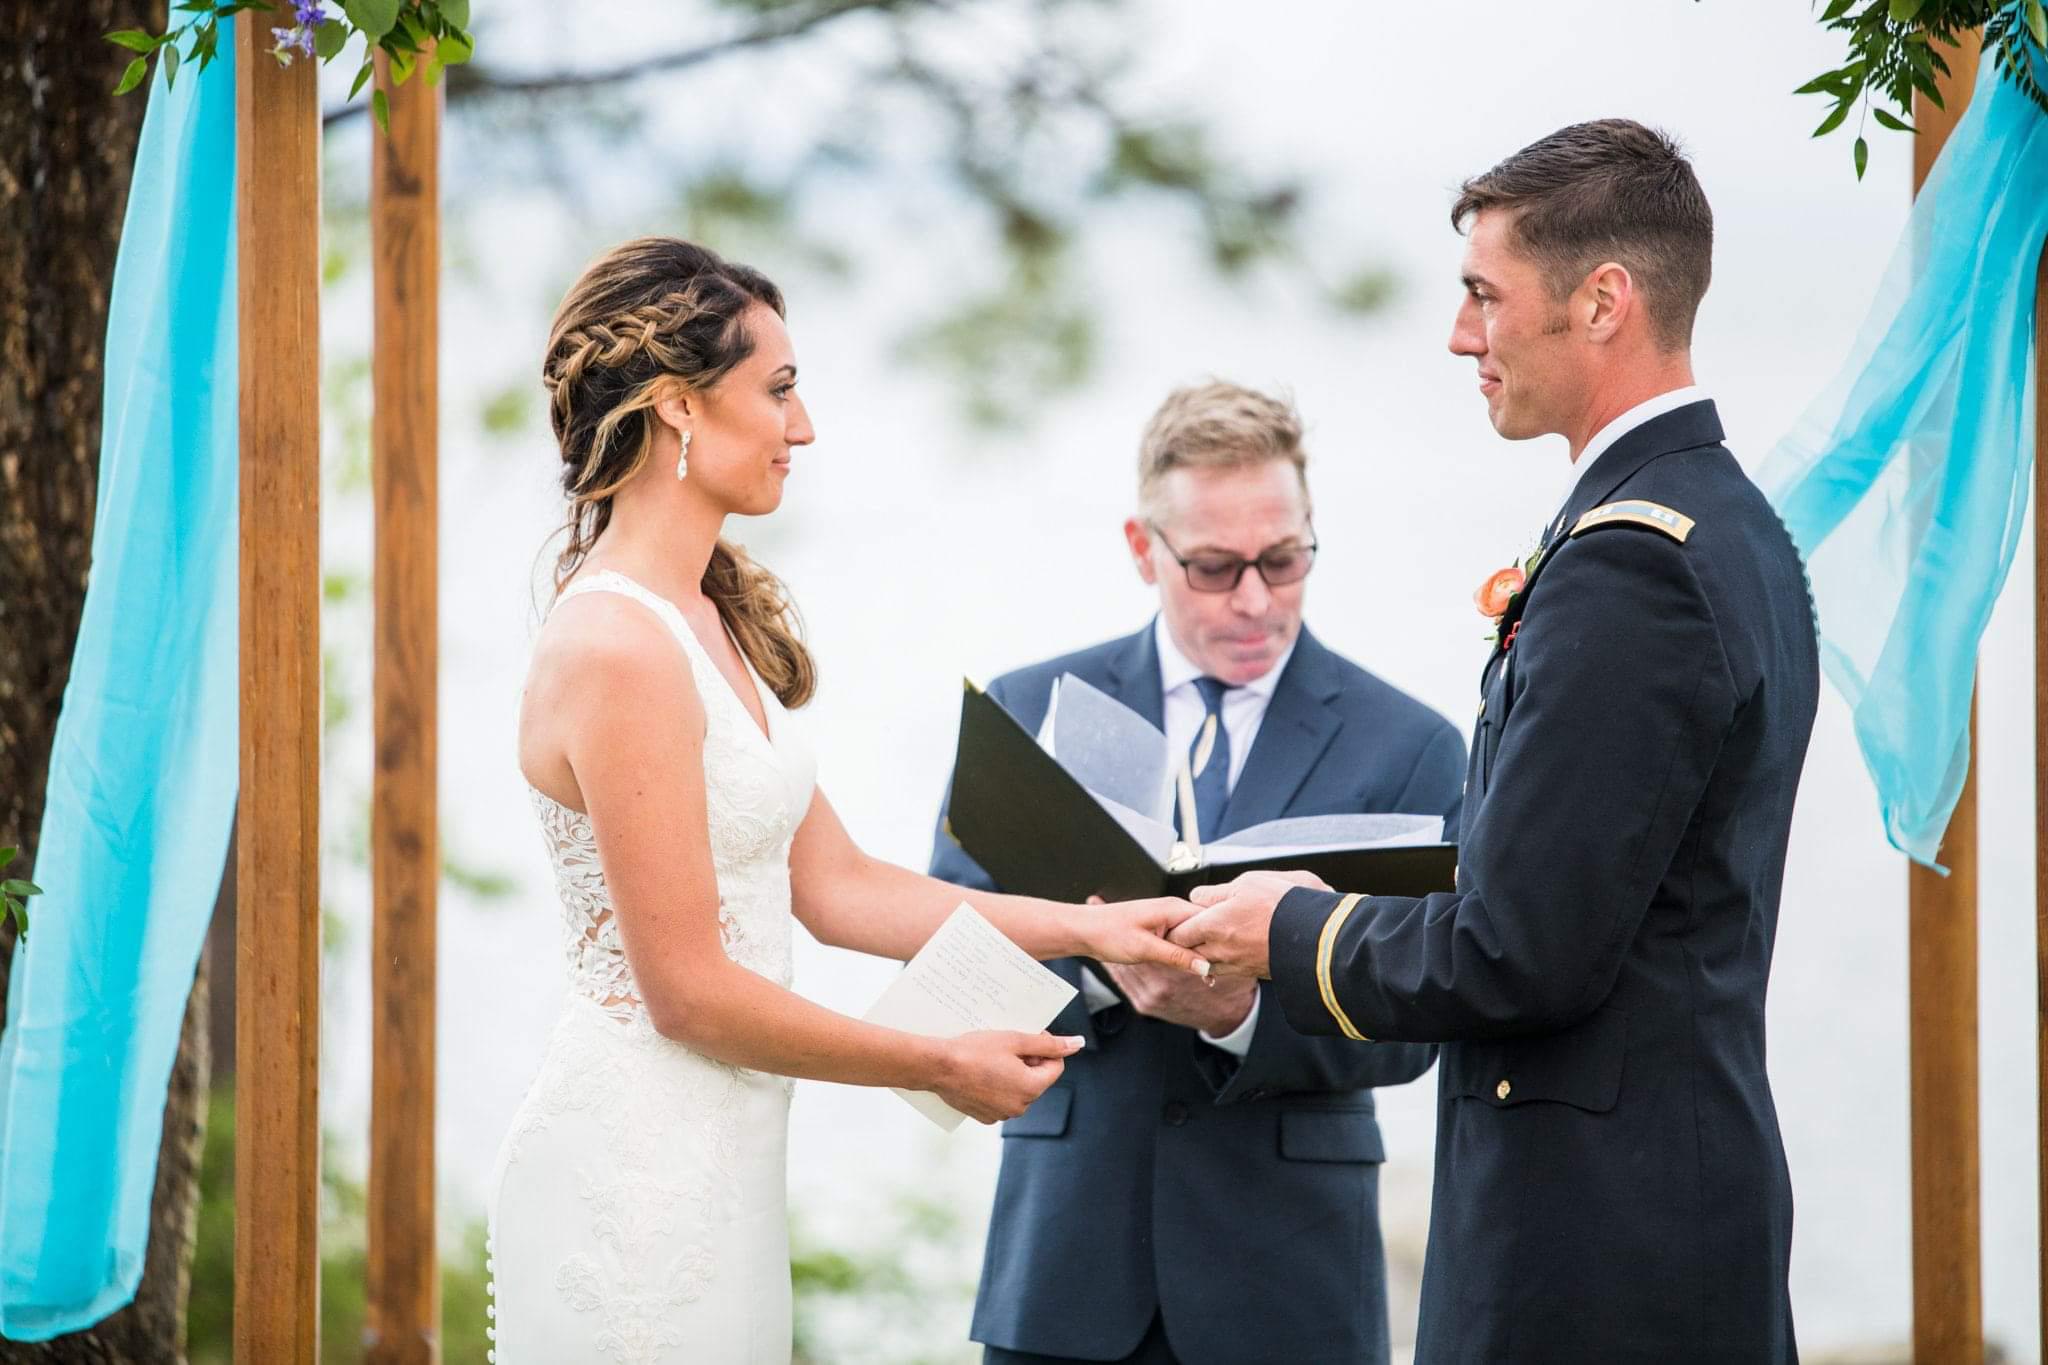 Tom wedding 2.jpg